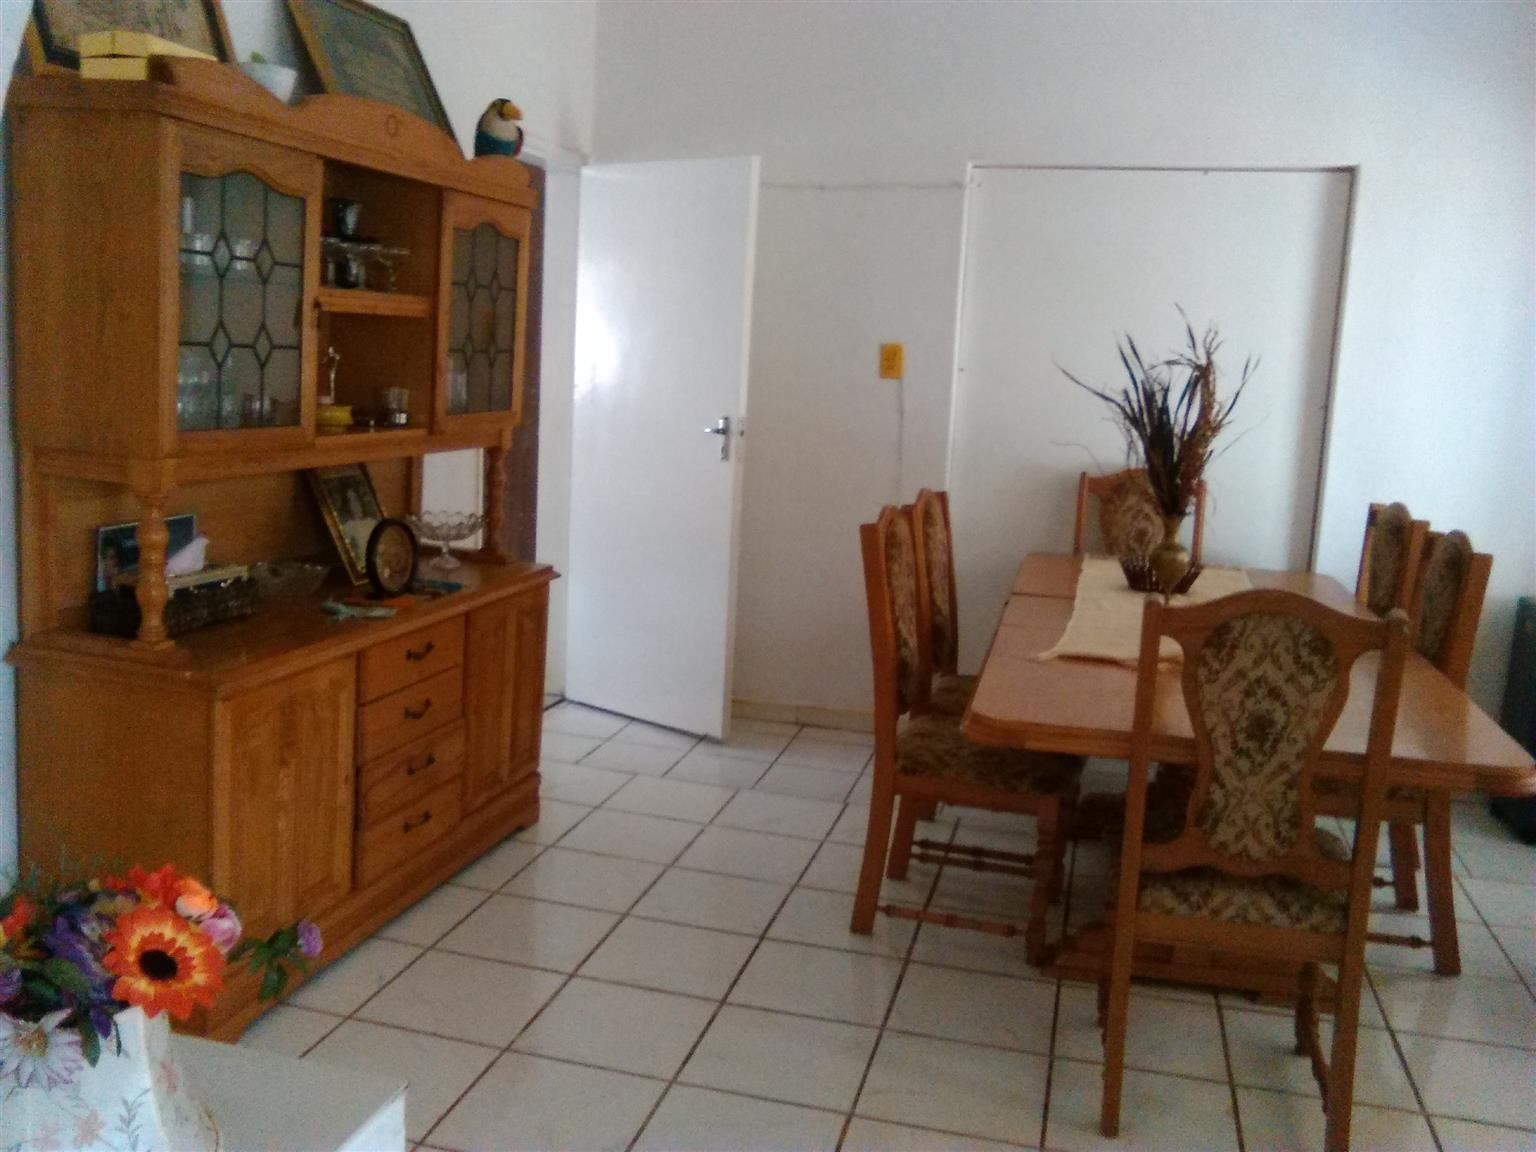 Sideboard or cabinet Dinning room